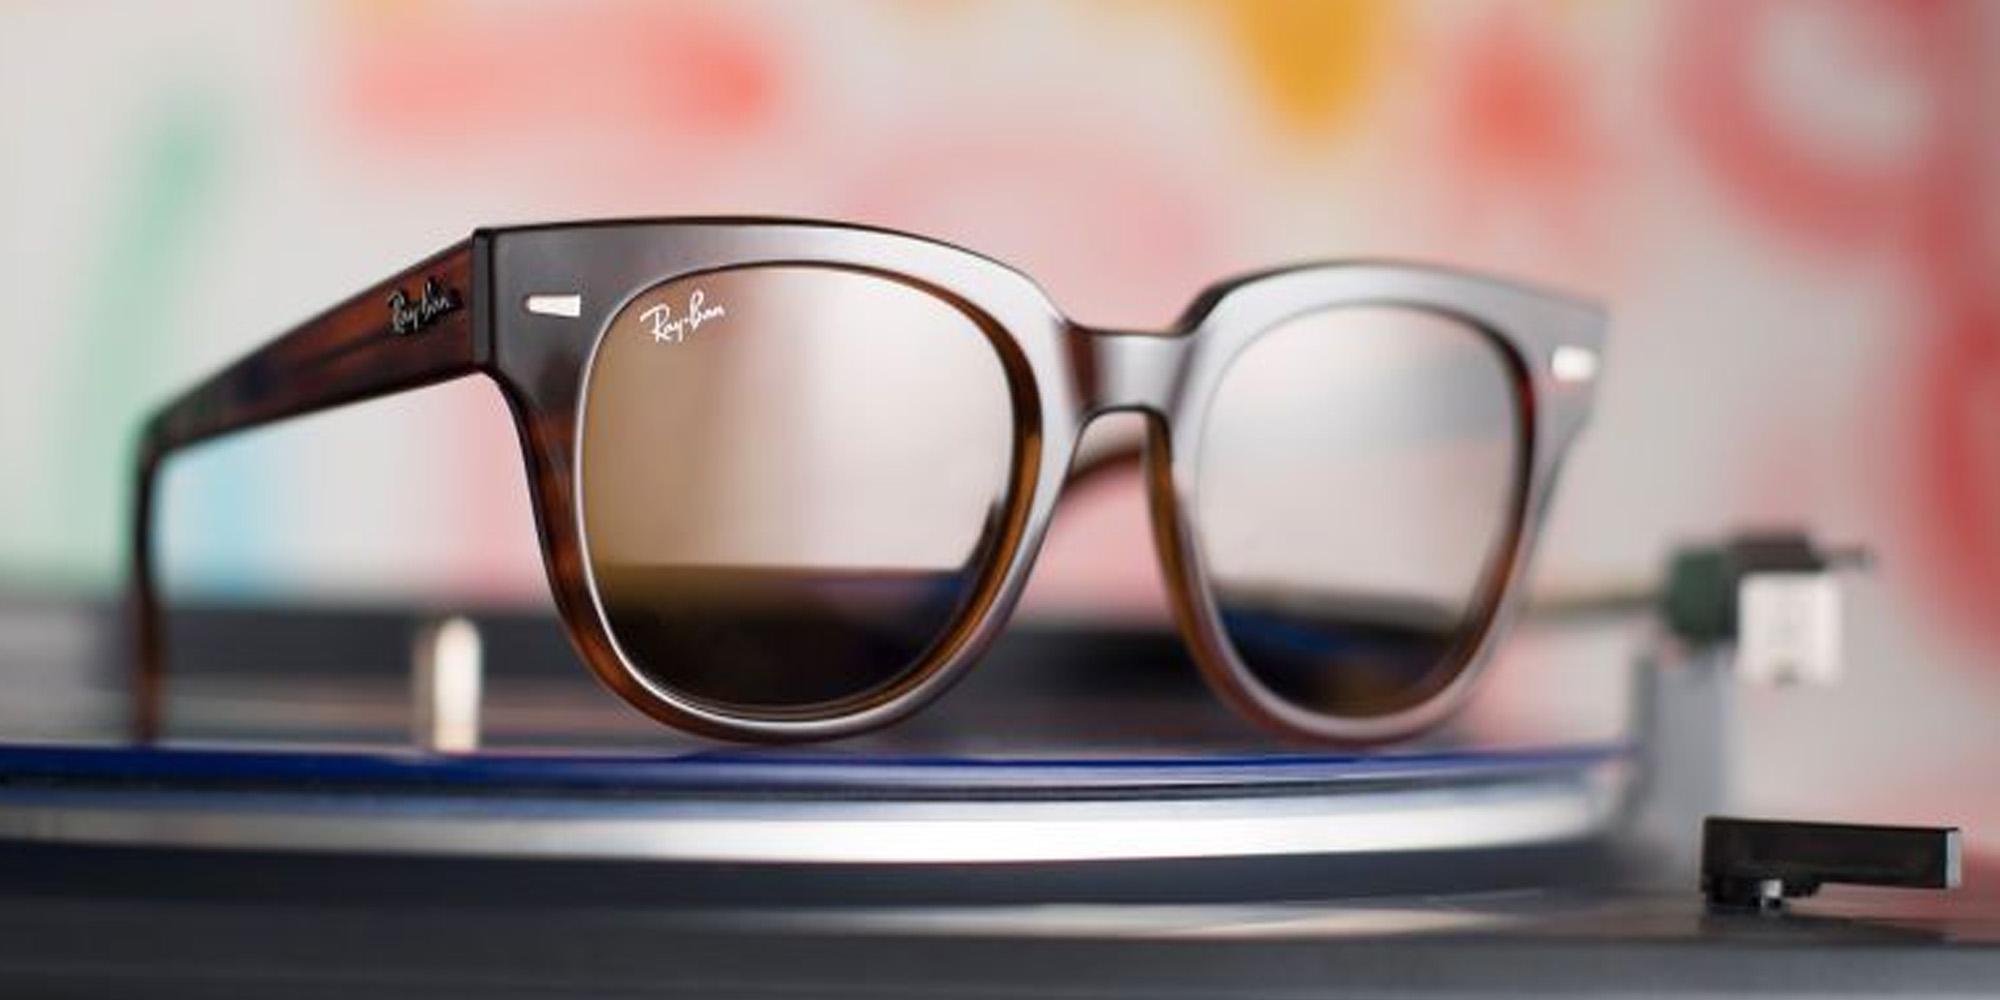 cd5416da005 Jomashop designer sunglasses event is up to 75% off  Ray-Ban